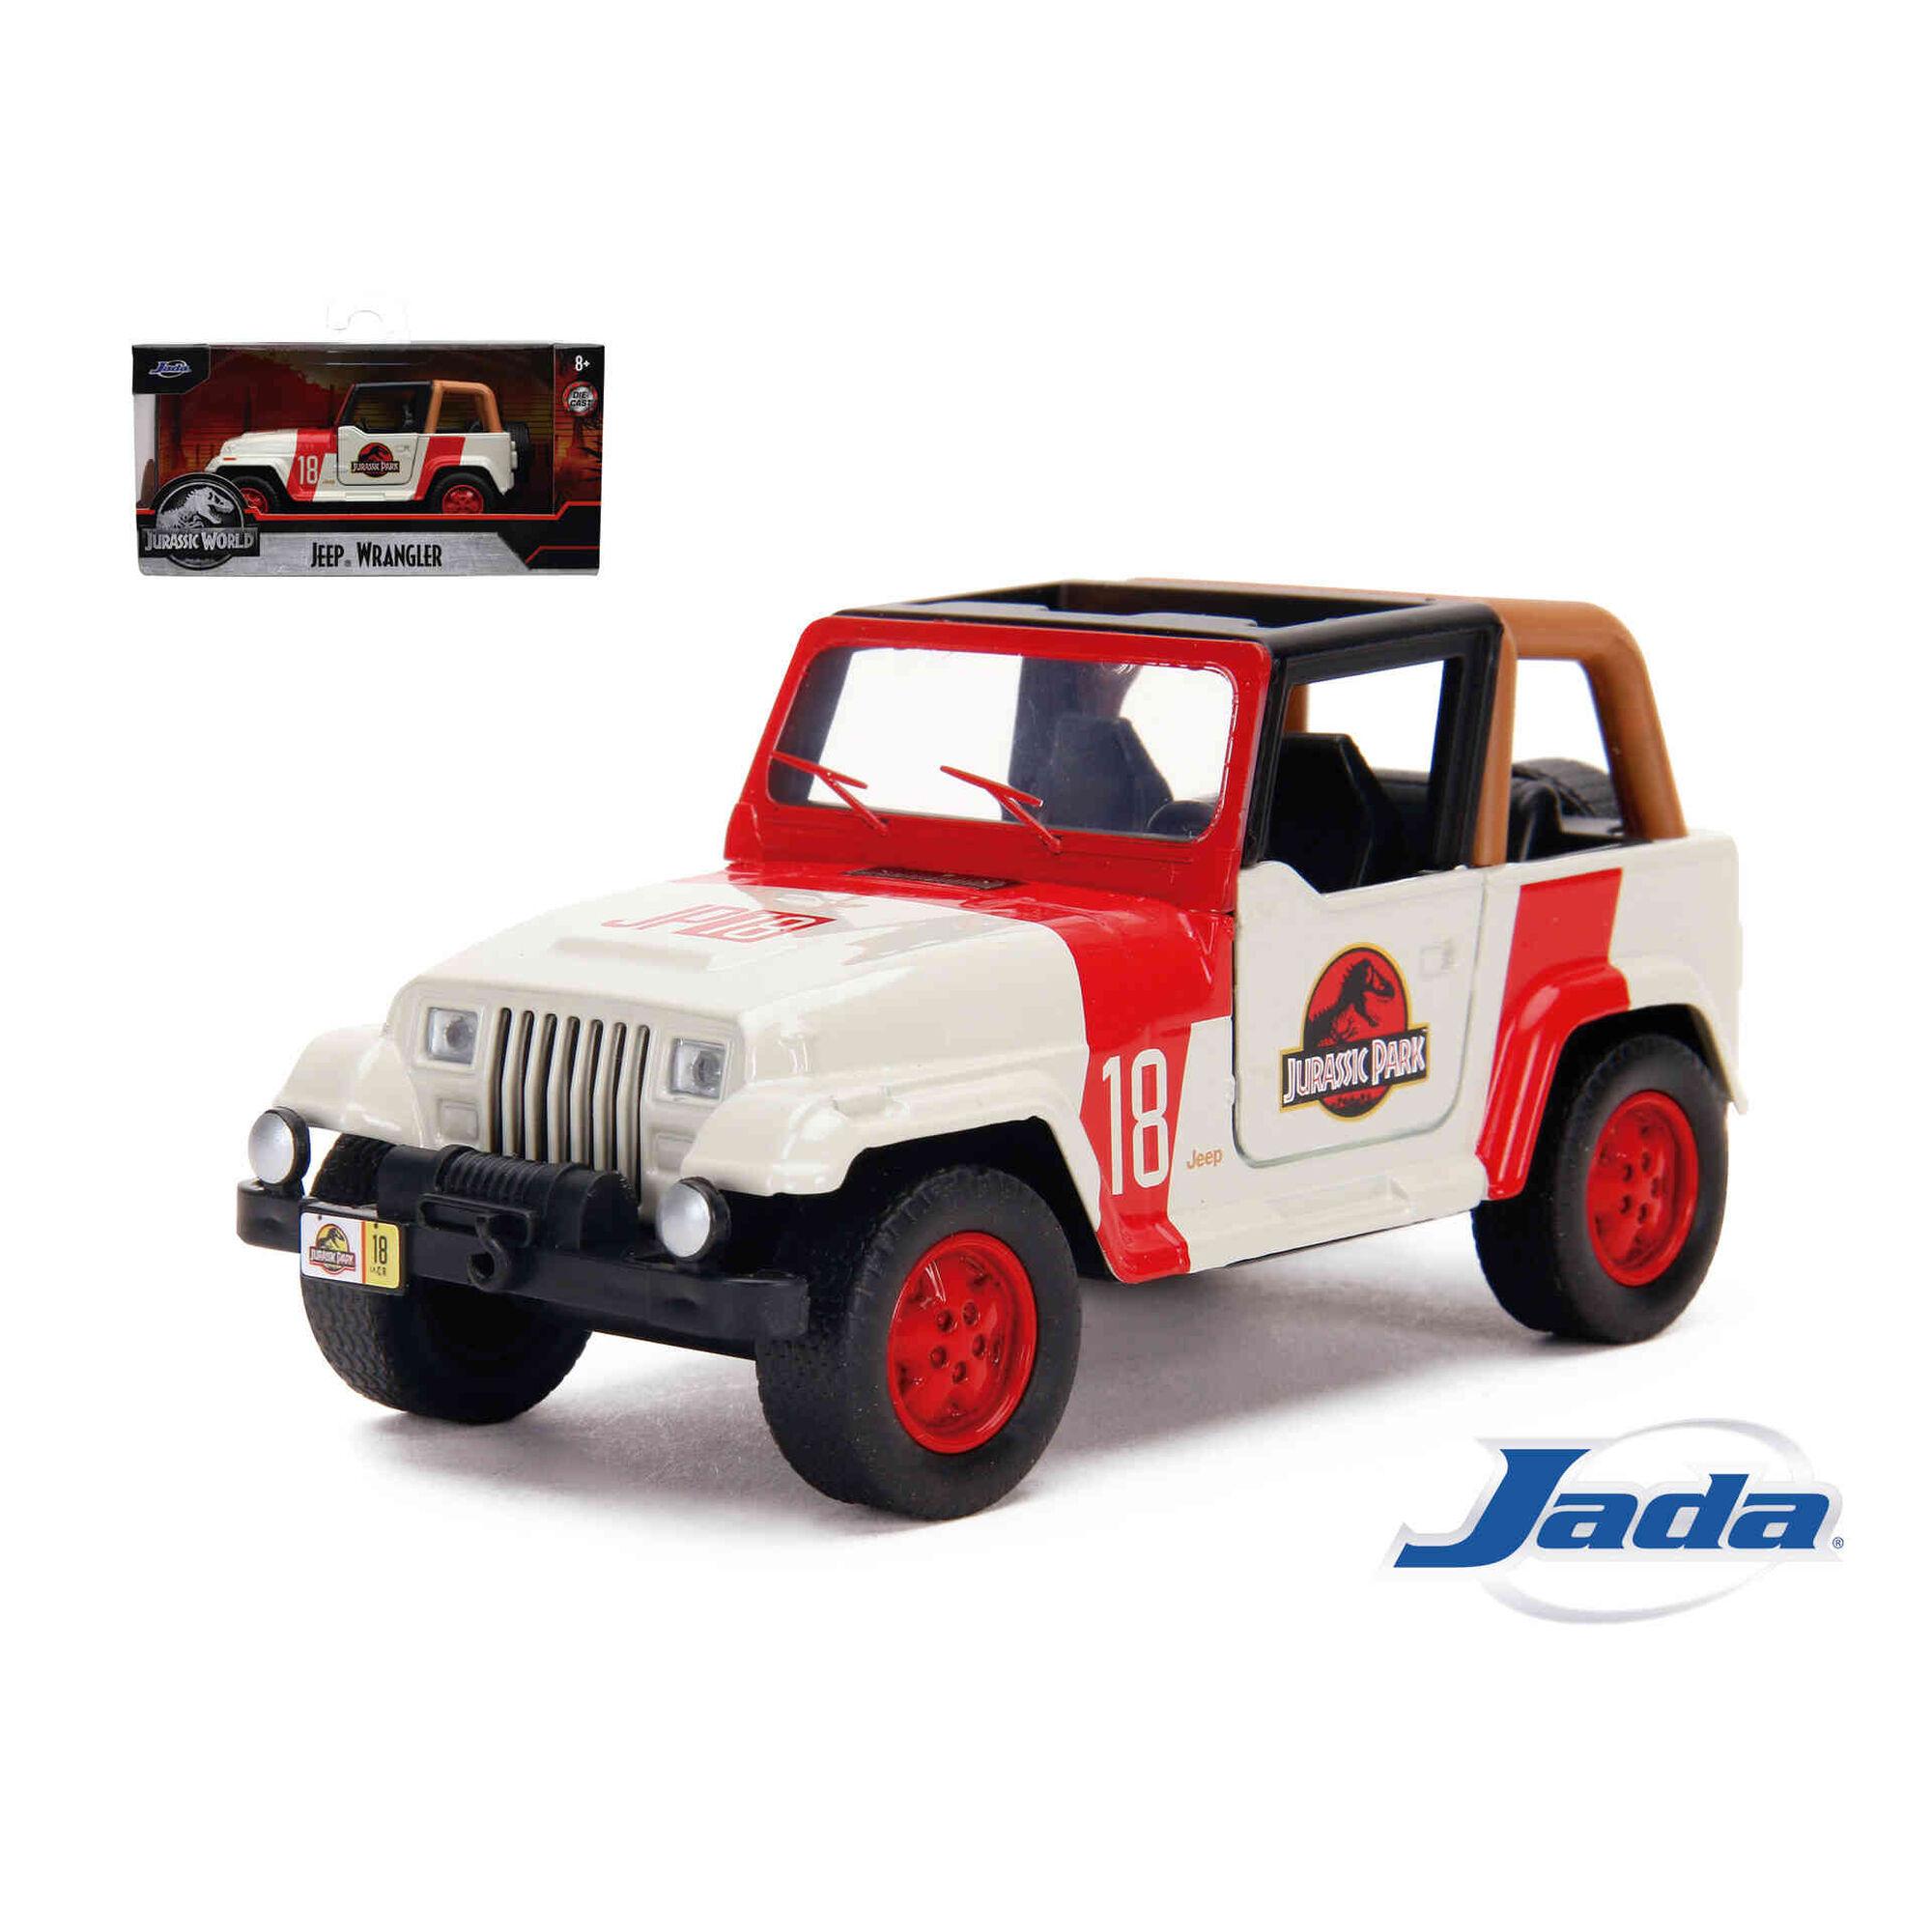 Jurassic Park Jeep Wrangler 1:32